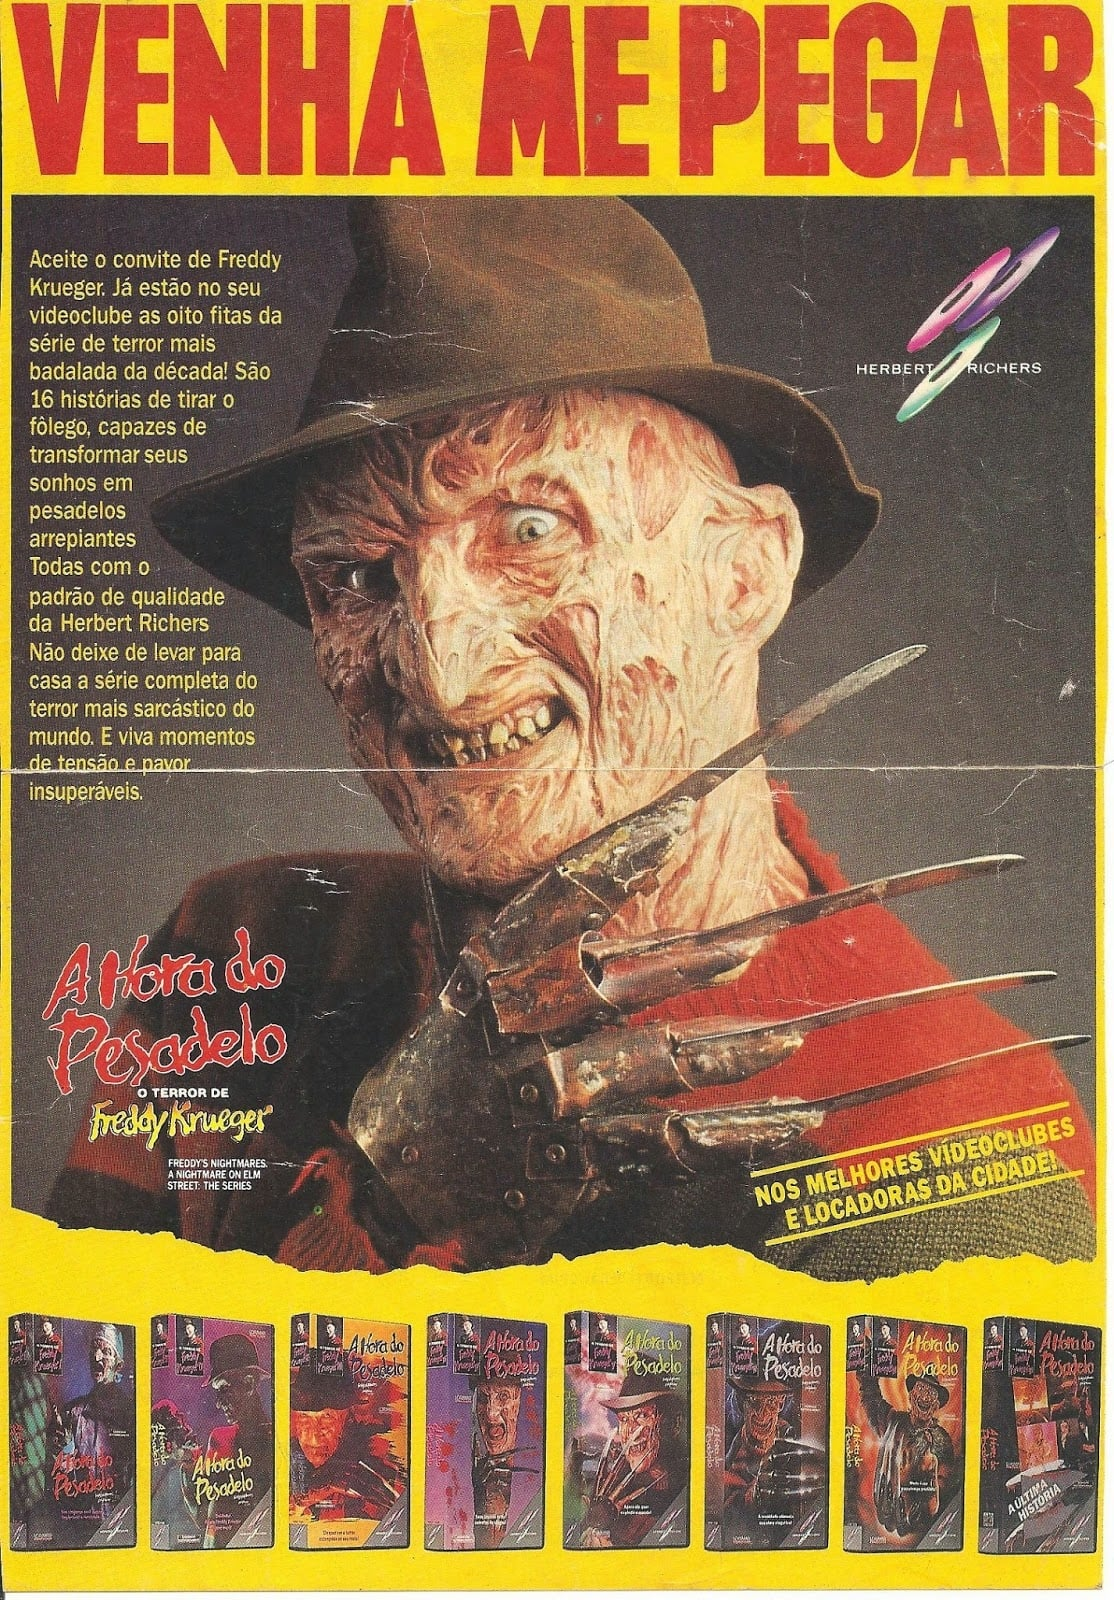 Freddy's Nightmares (1988)